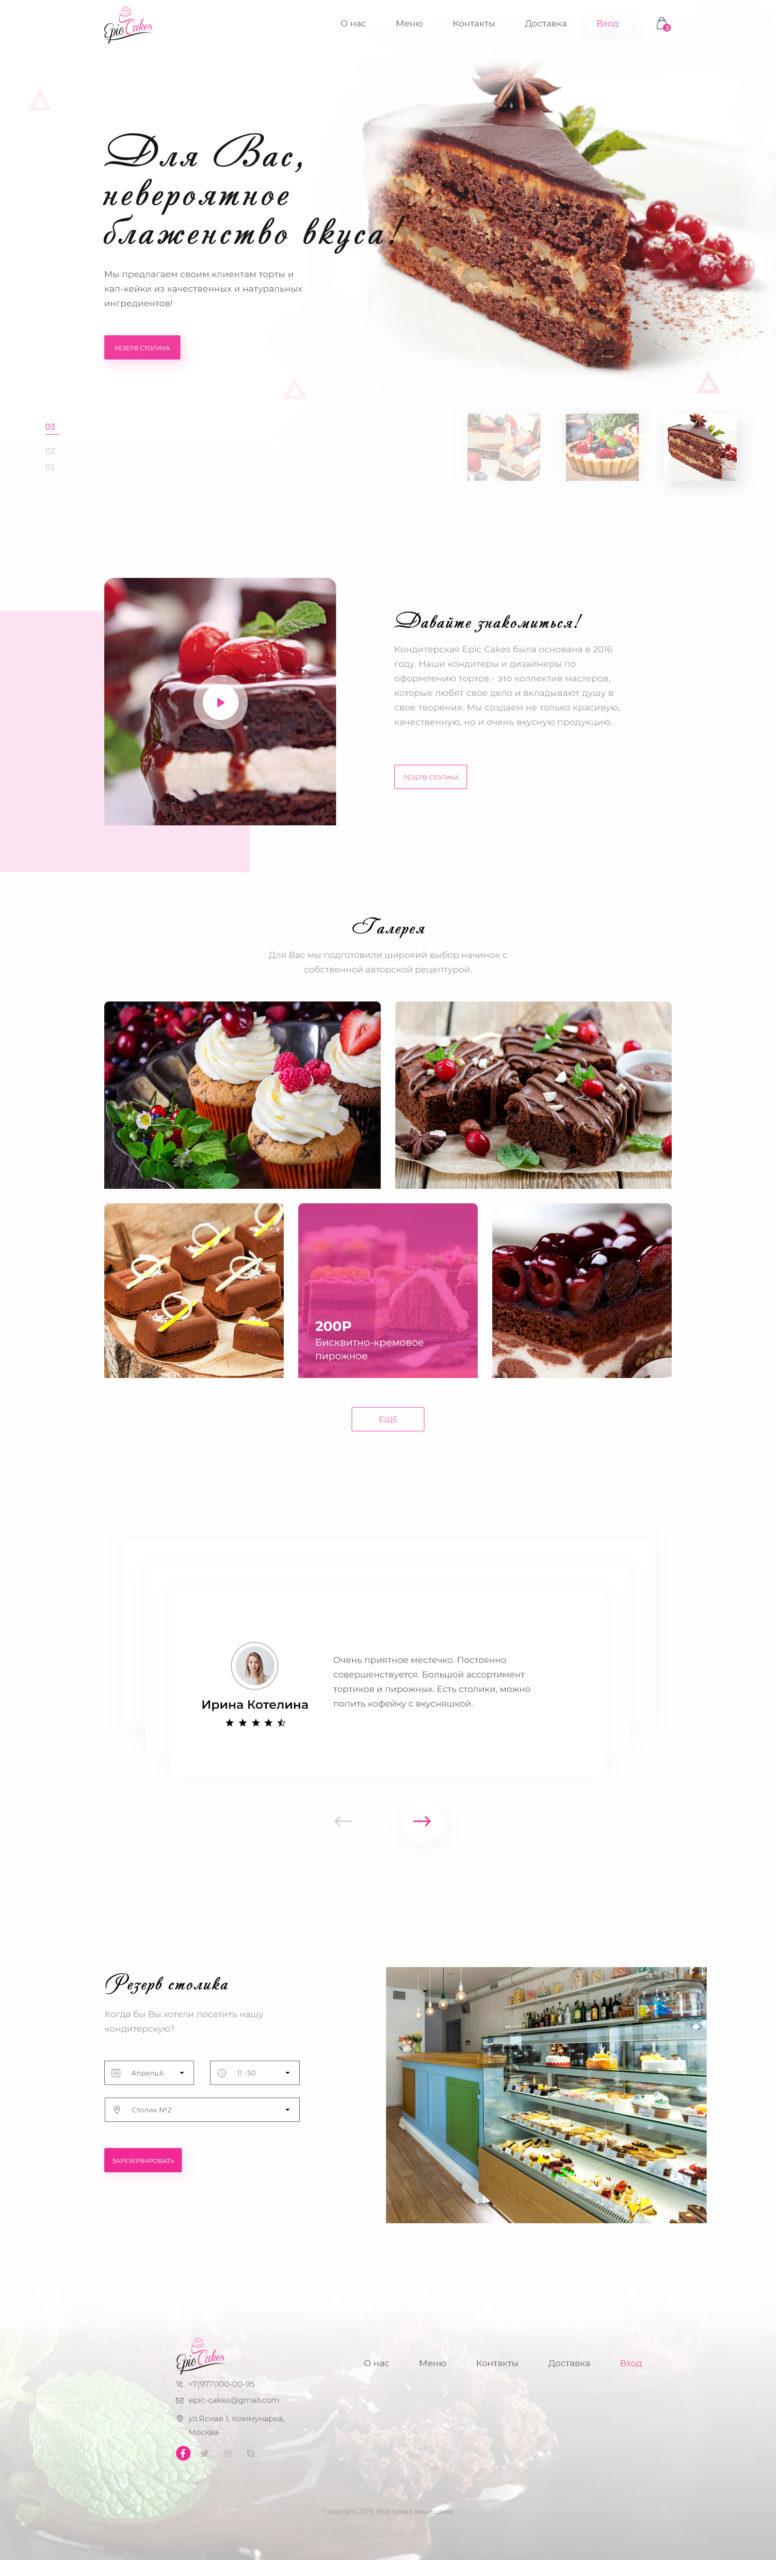 https://28-digital.ru/project/epic-cakes/